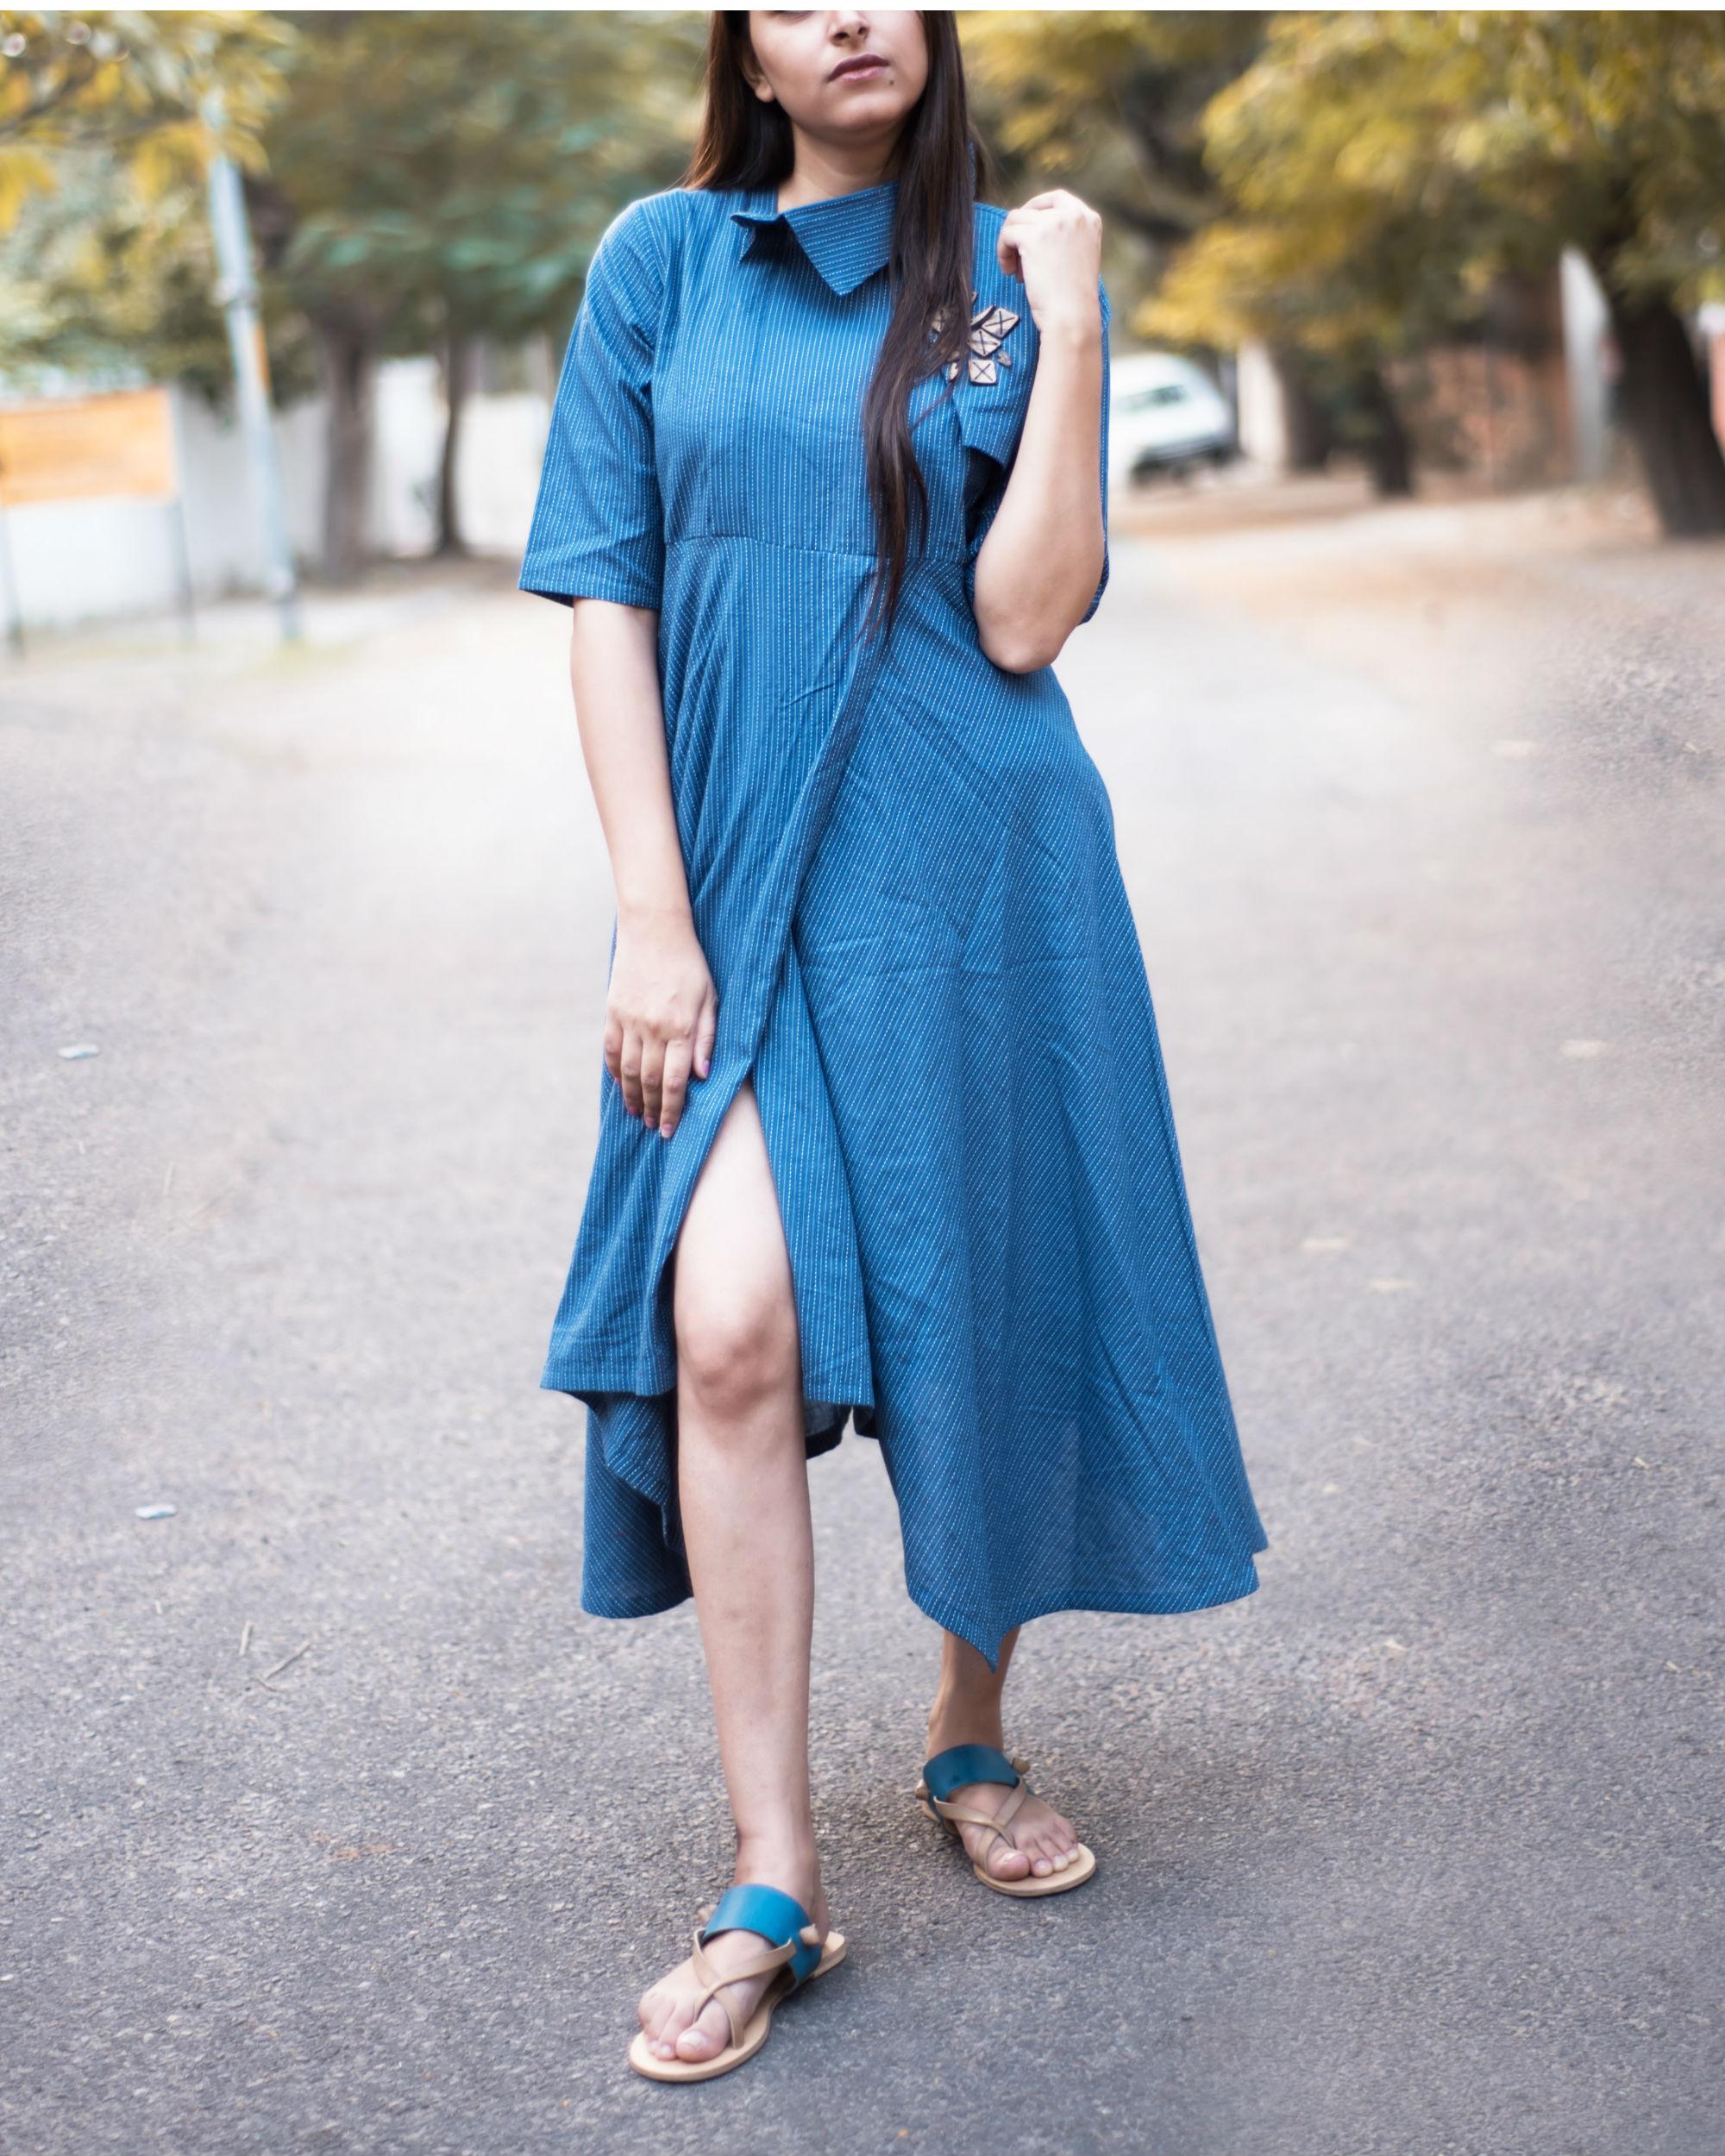 d6751caef80c7 Blue asymmetrical dobi trench tunic by Label Harsha Khatry